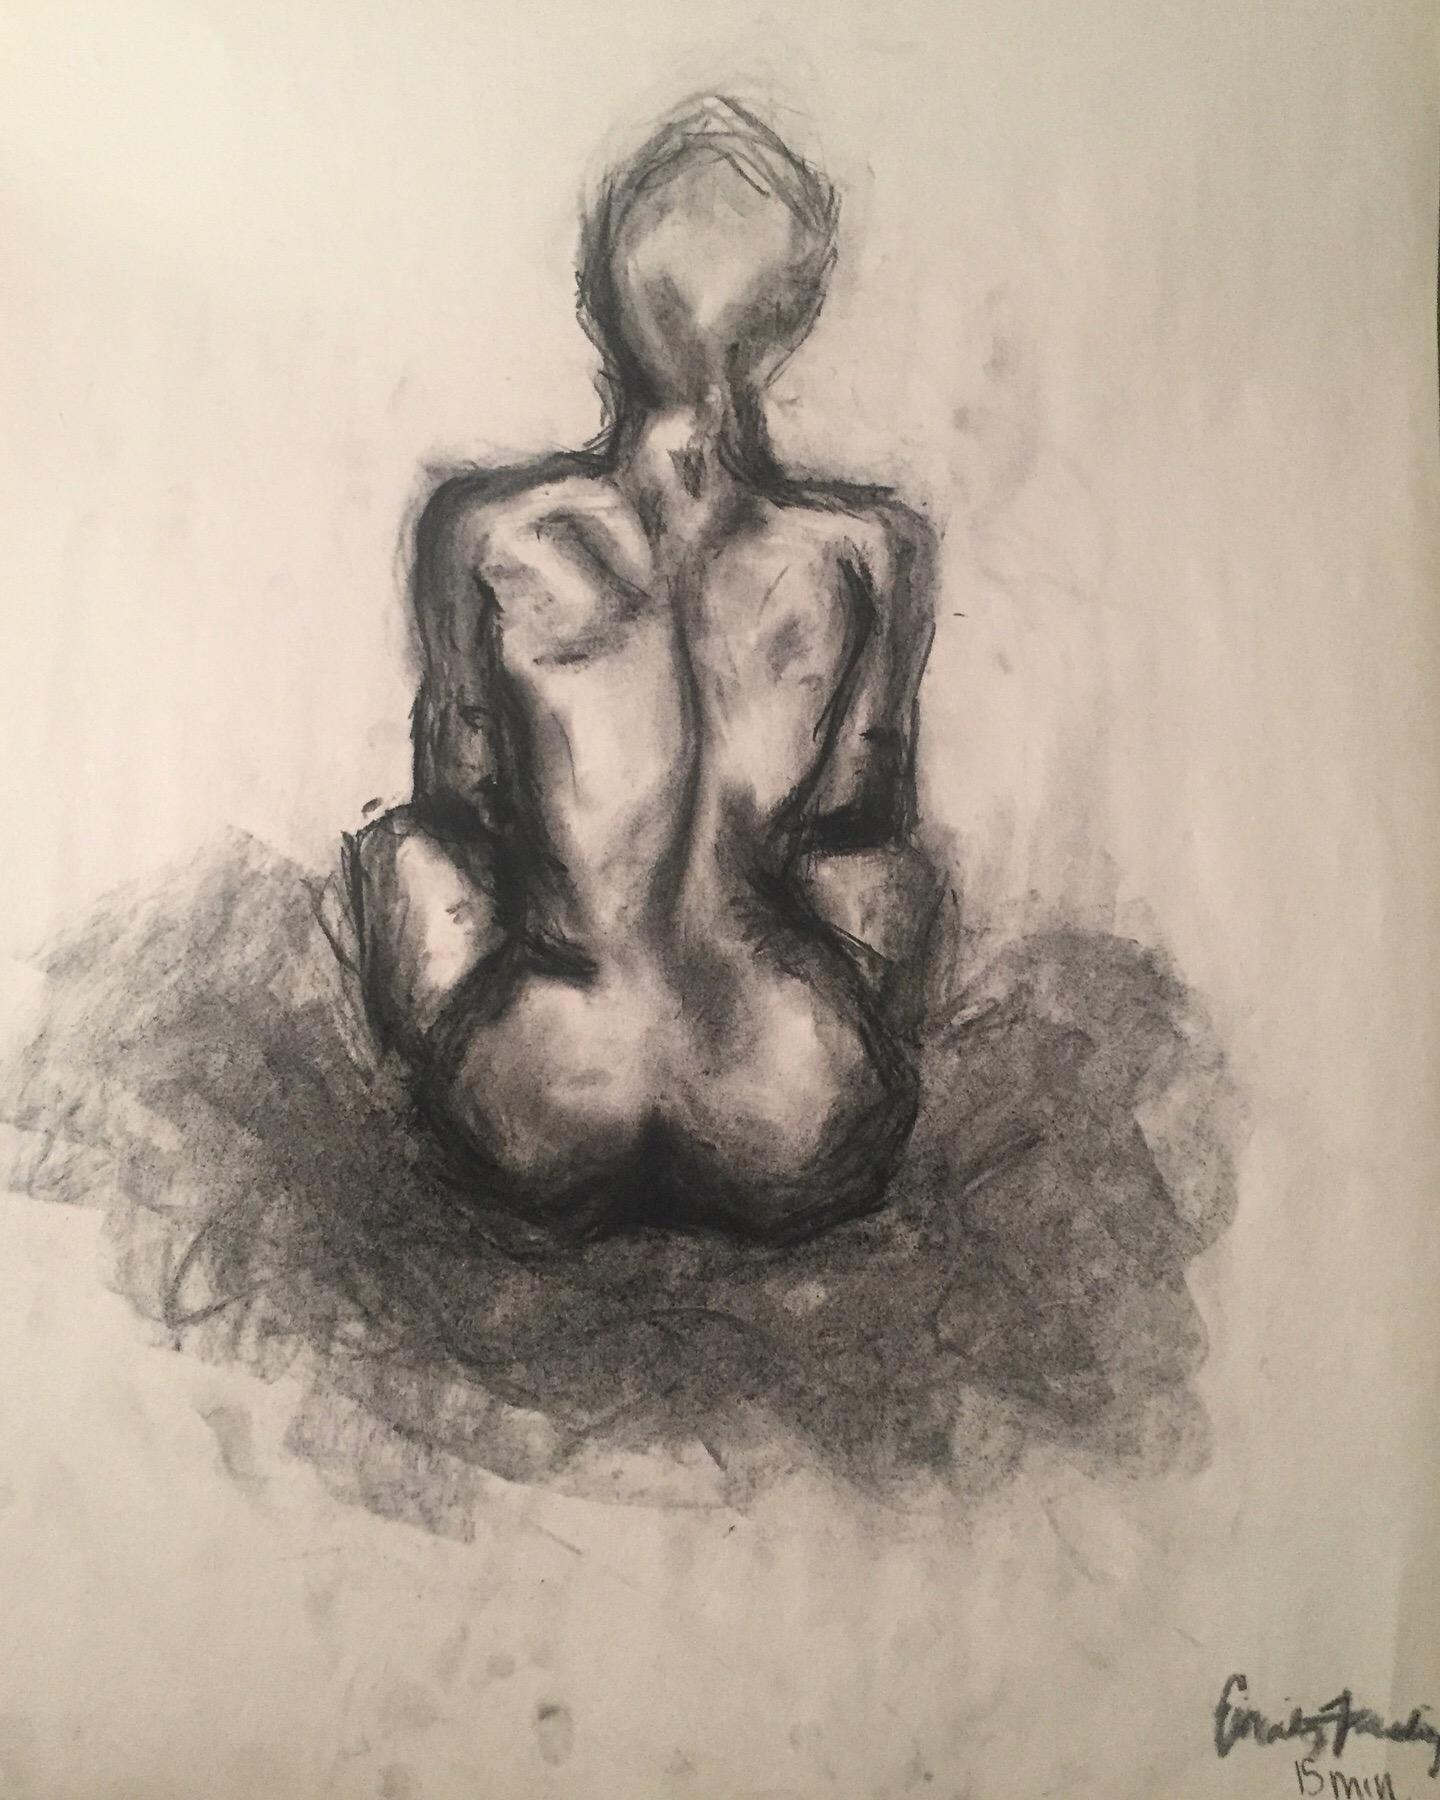 15 min. Figure drawing